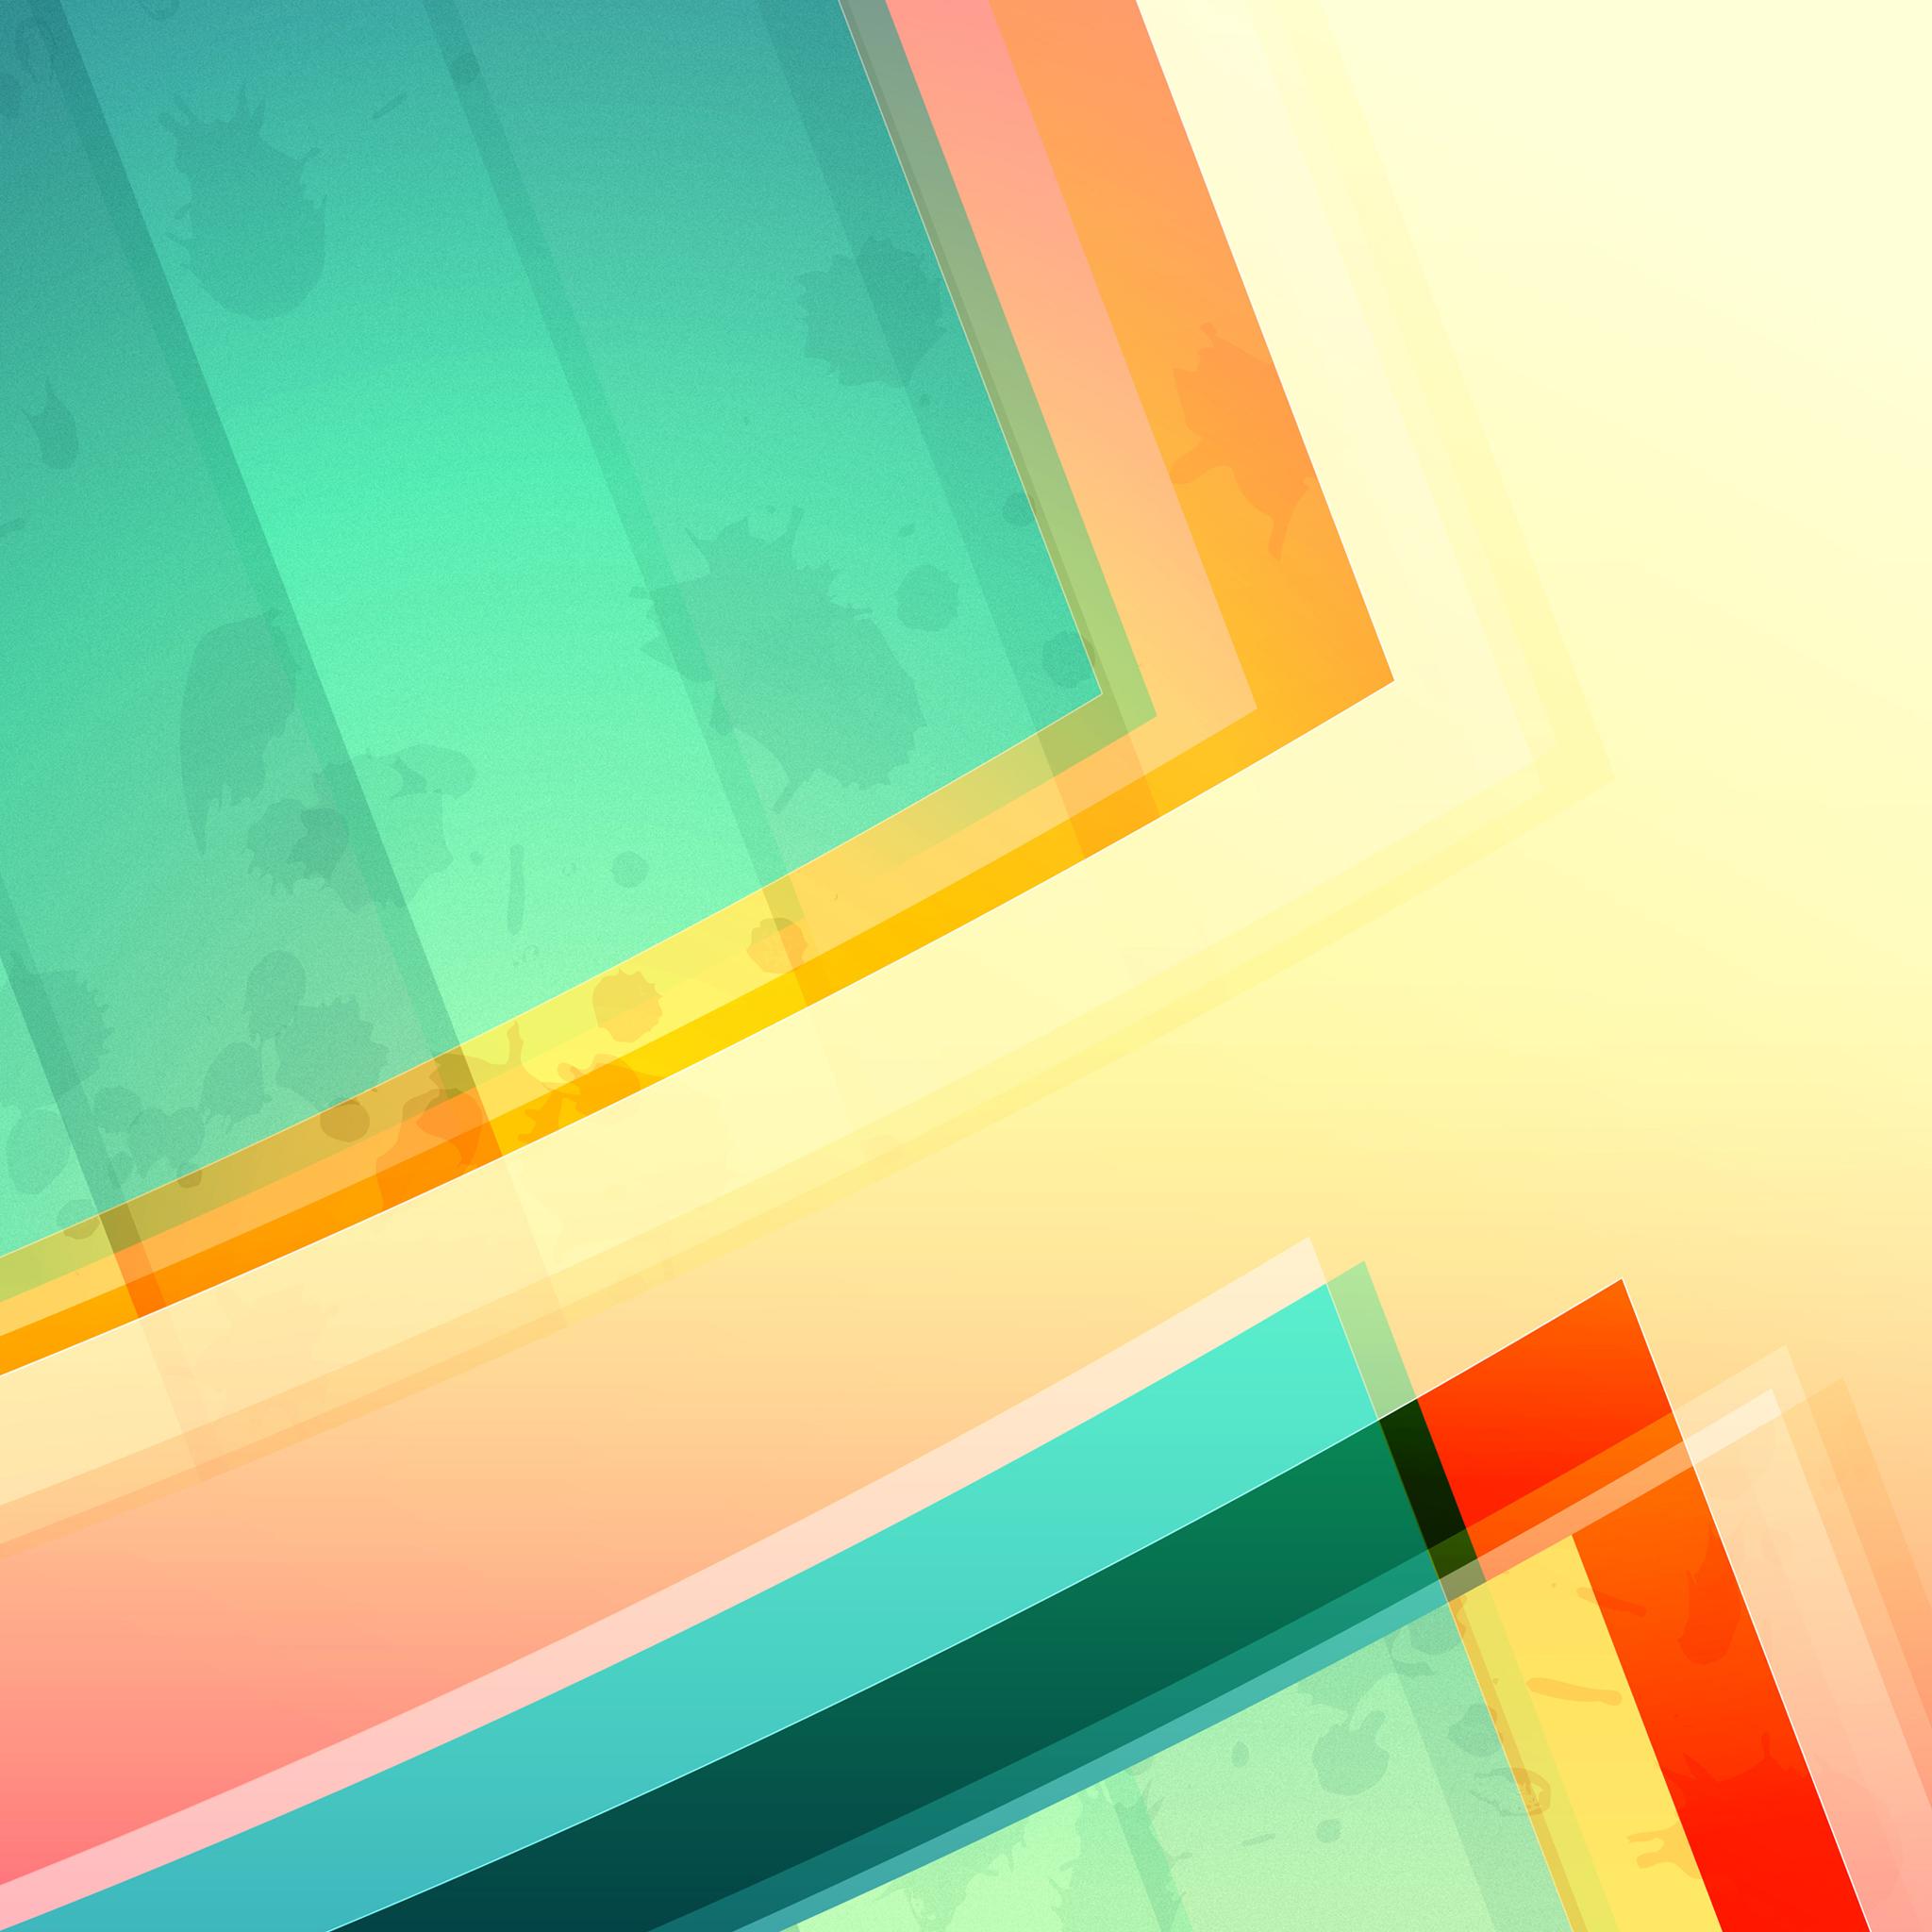 fading_3Wallpapers ipad Retina